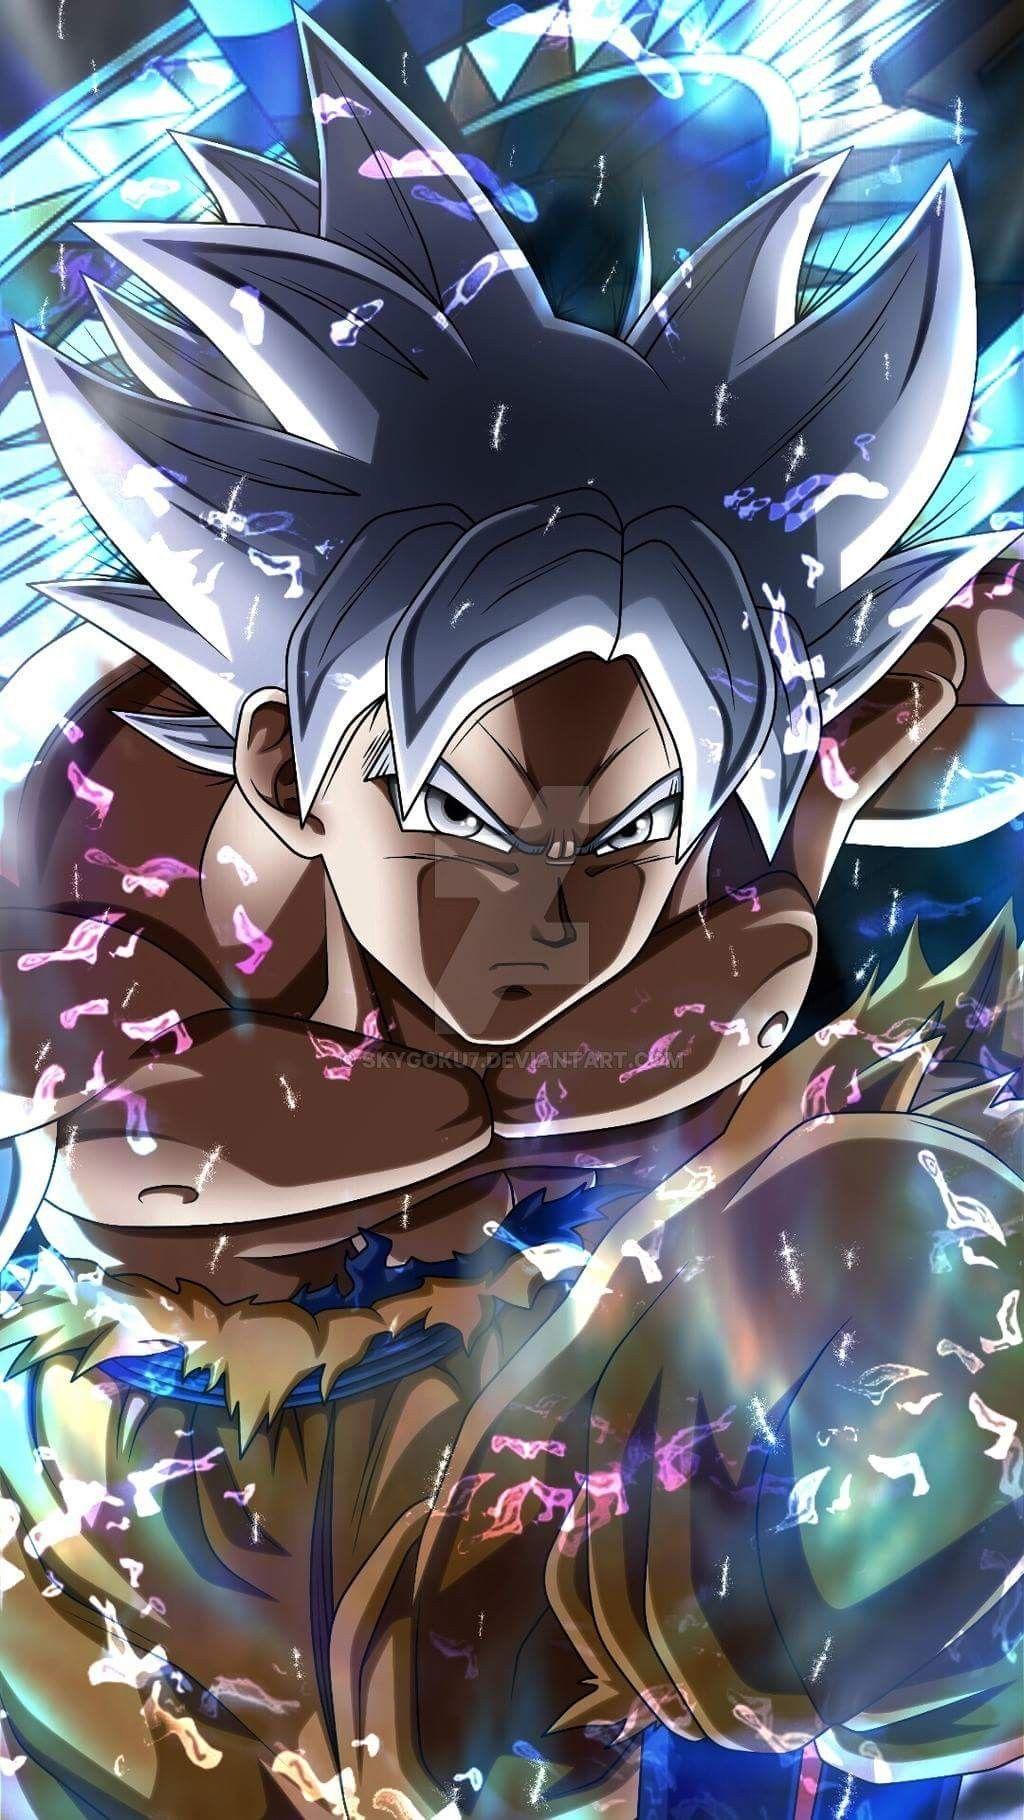 Pin By Axel Bouvier On Son Goku Dbz Super Anime Dragon Ball Super Dragon Ball Wallpapers Dragon Ball Goku